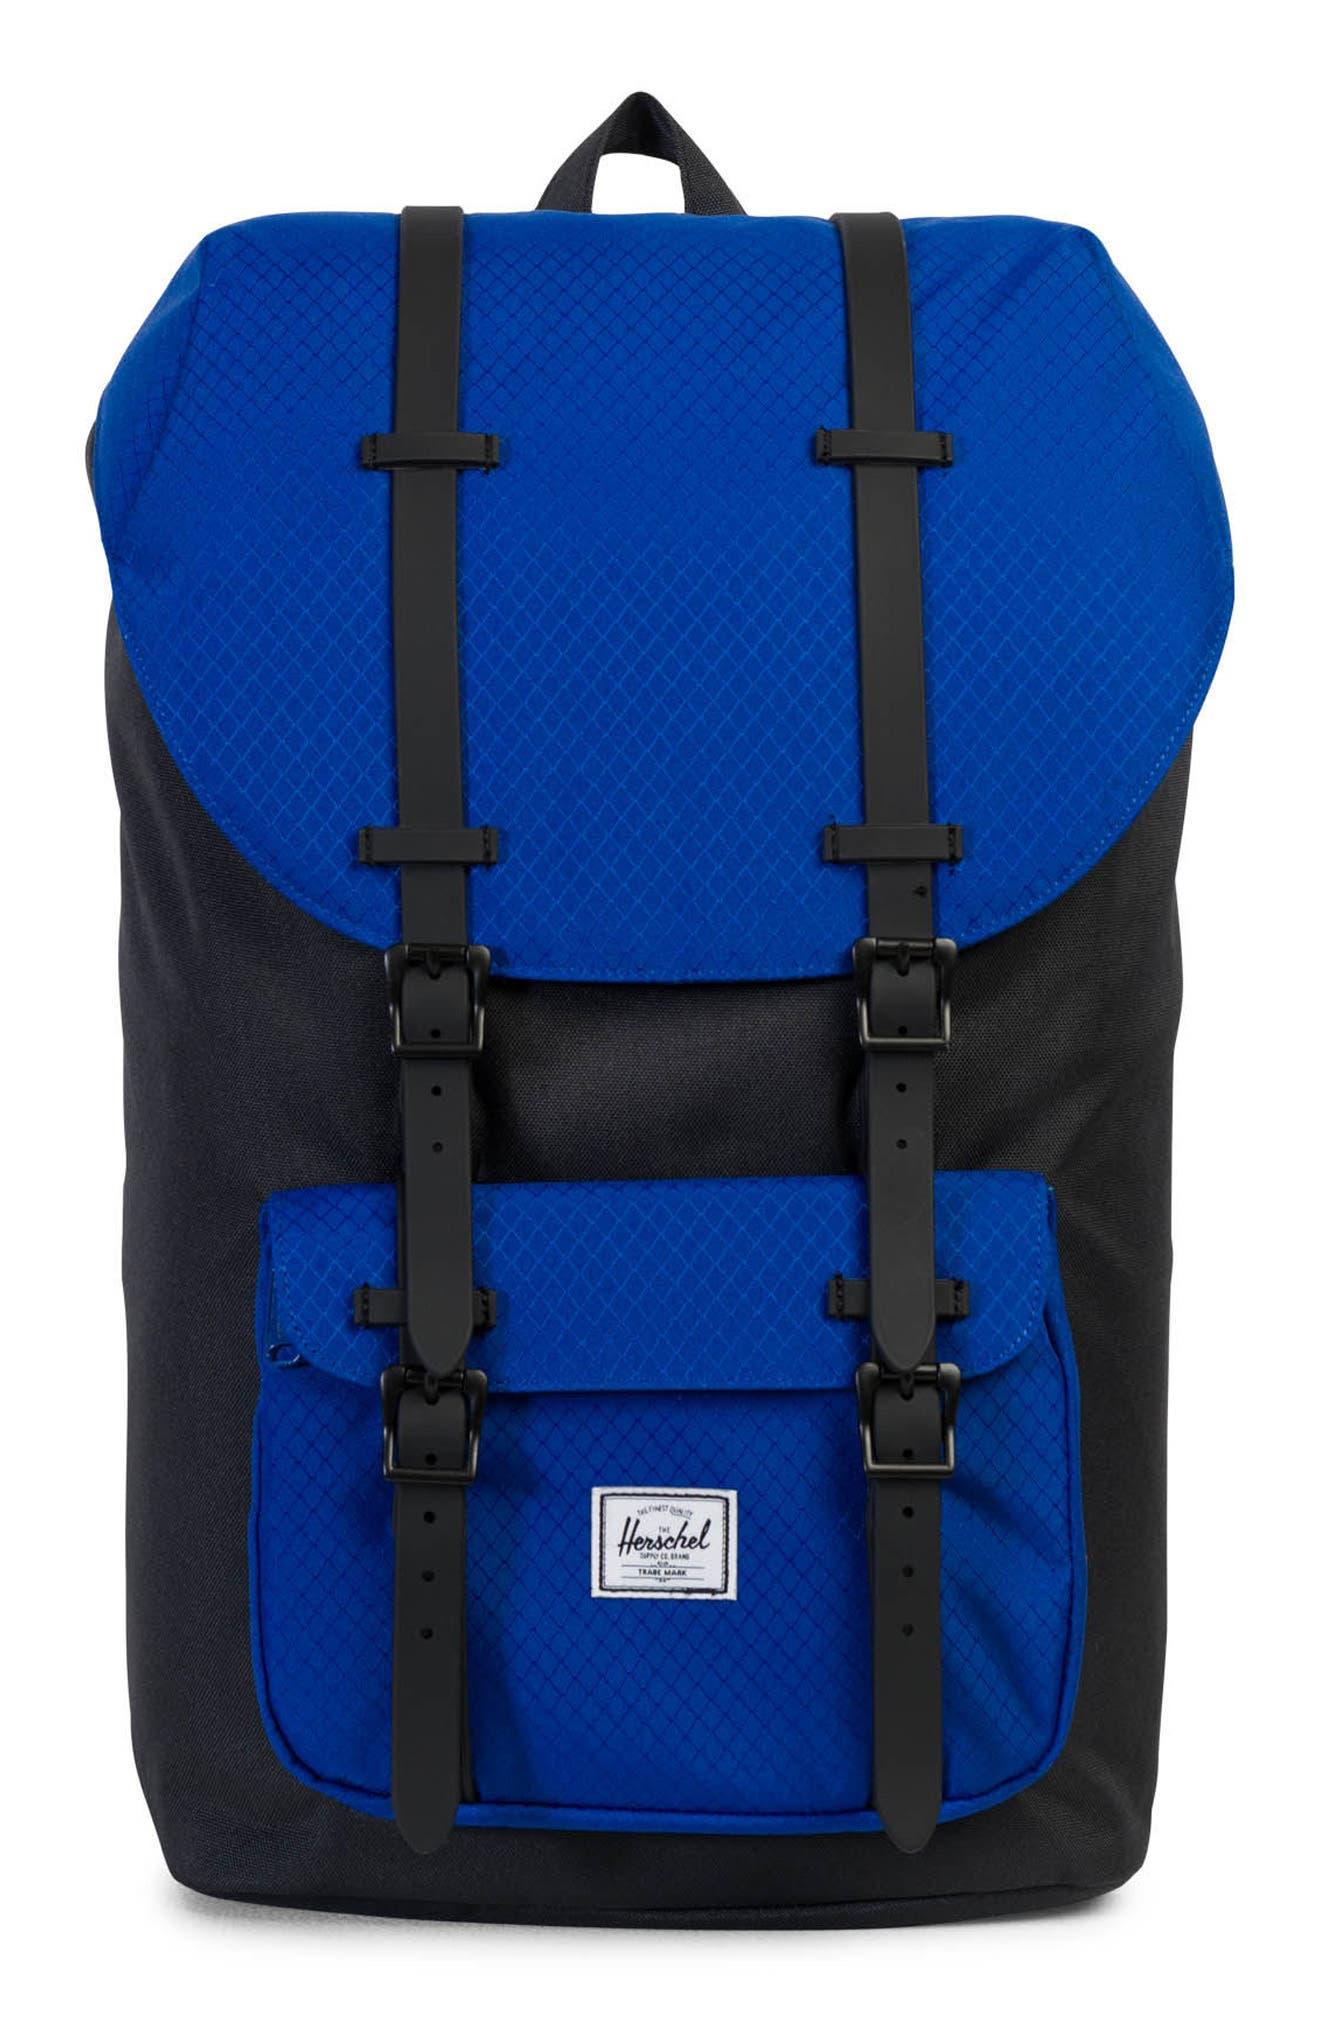 Alternate Image 1 Selected - Herschel Supply Co. Little America Contrast Backpack